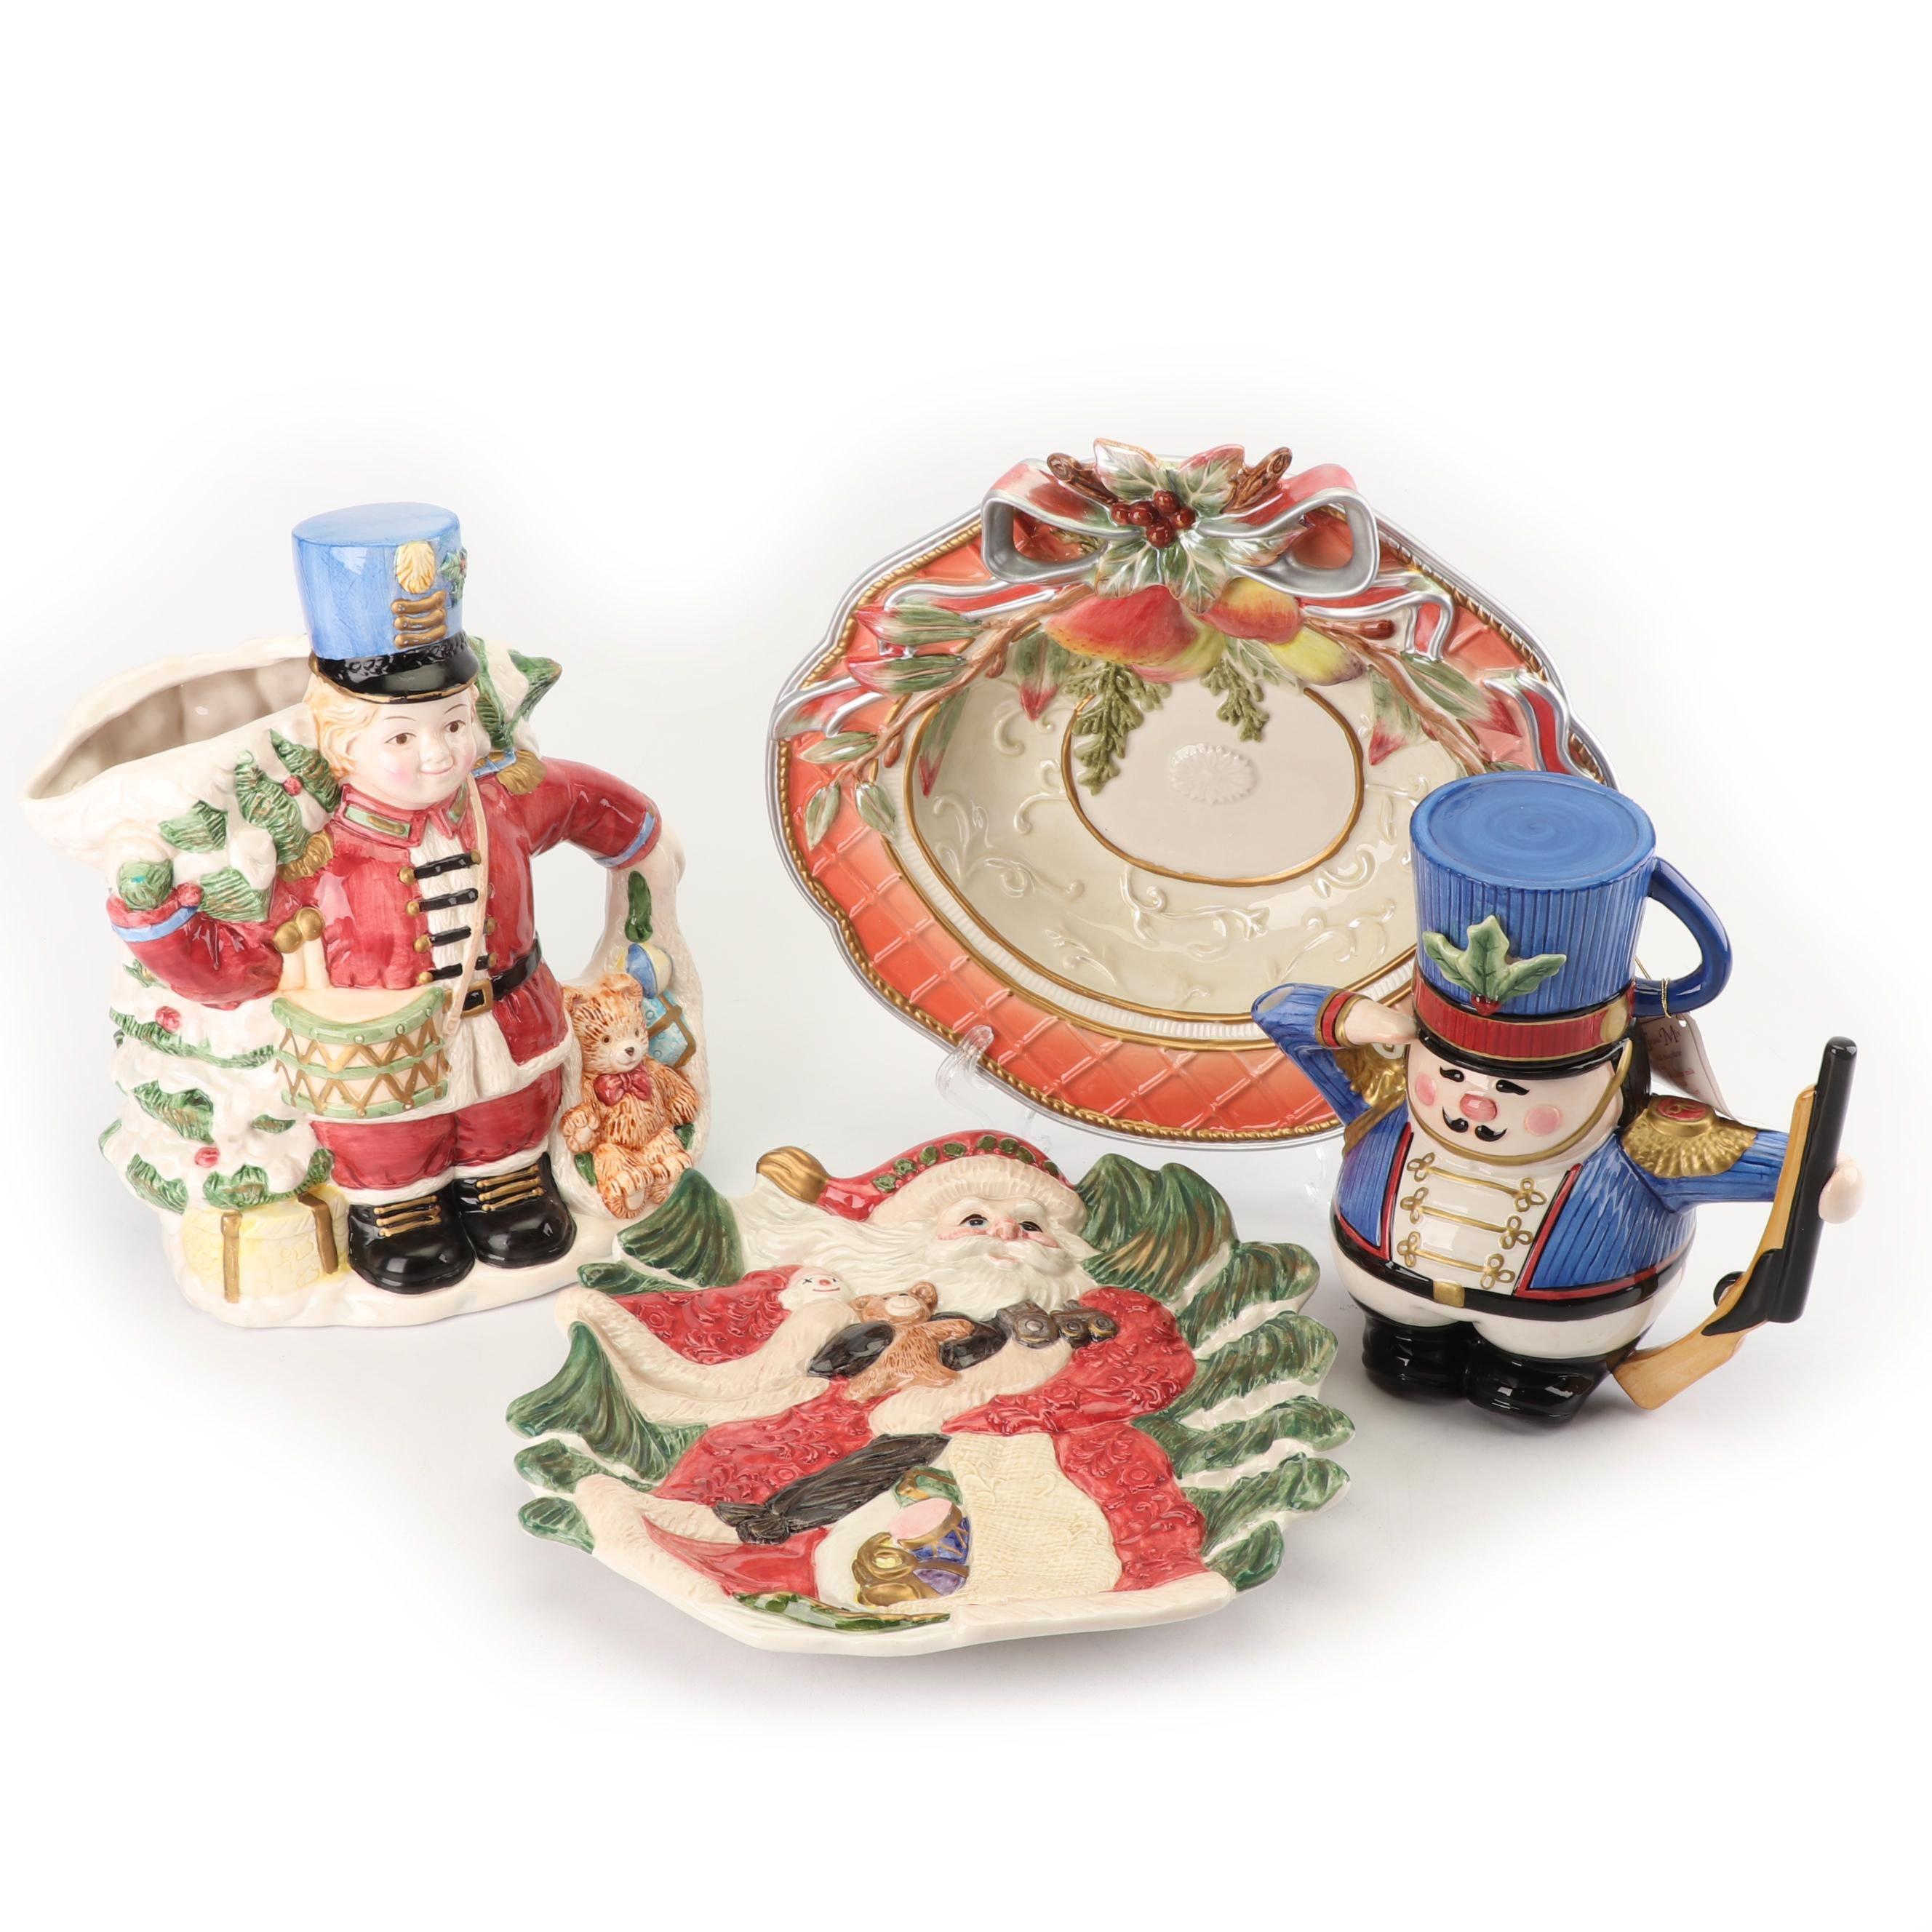 Fitz and Floyd Ceramic Holiday Serveware